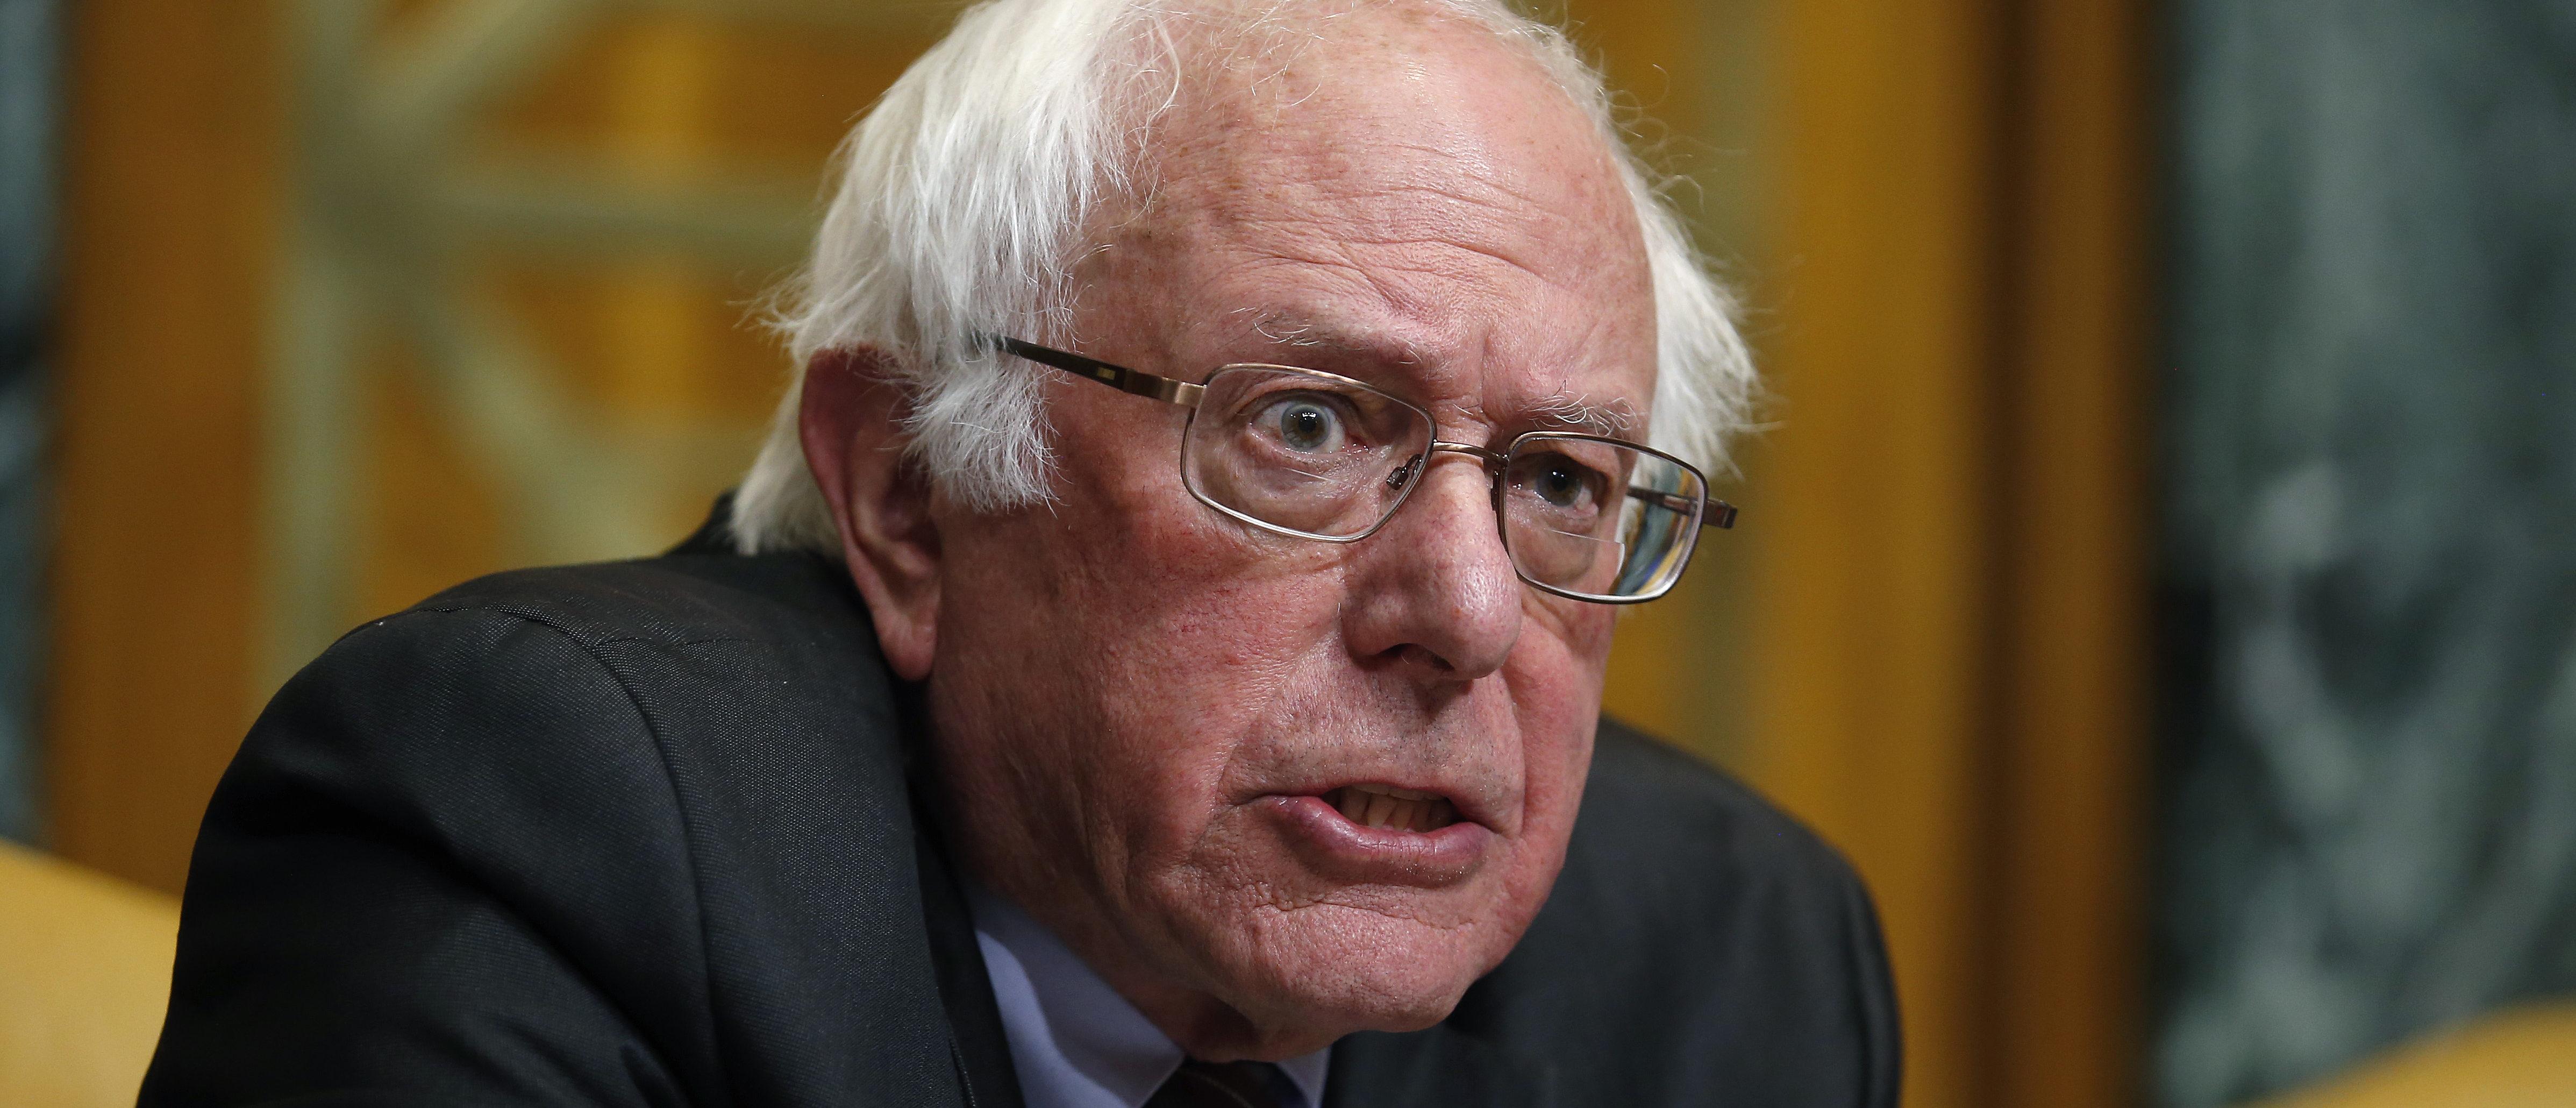 U.S. Senator Bernie Sanders (I-VT) speaks